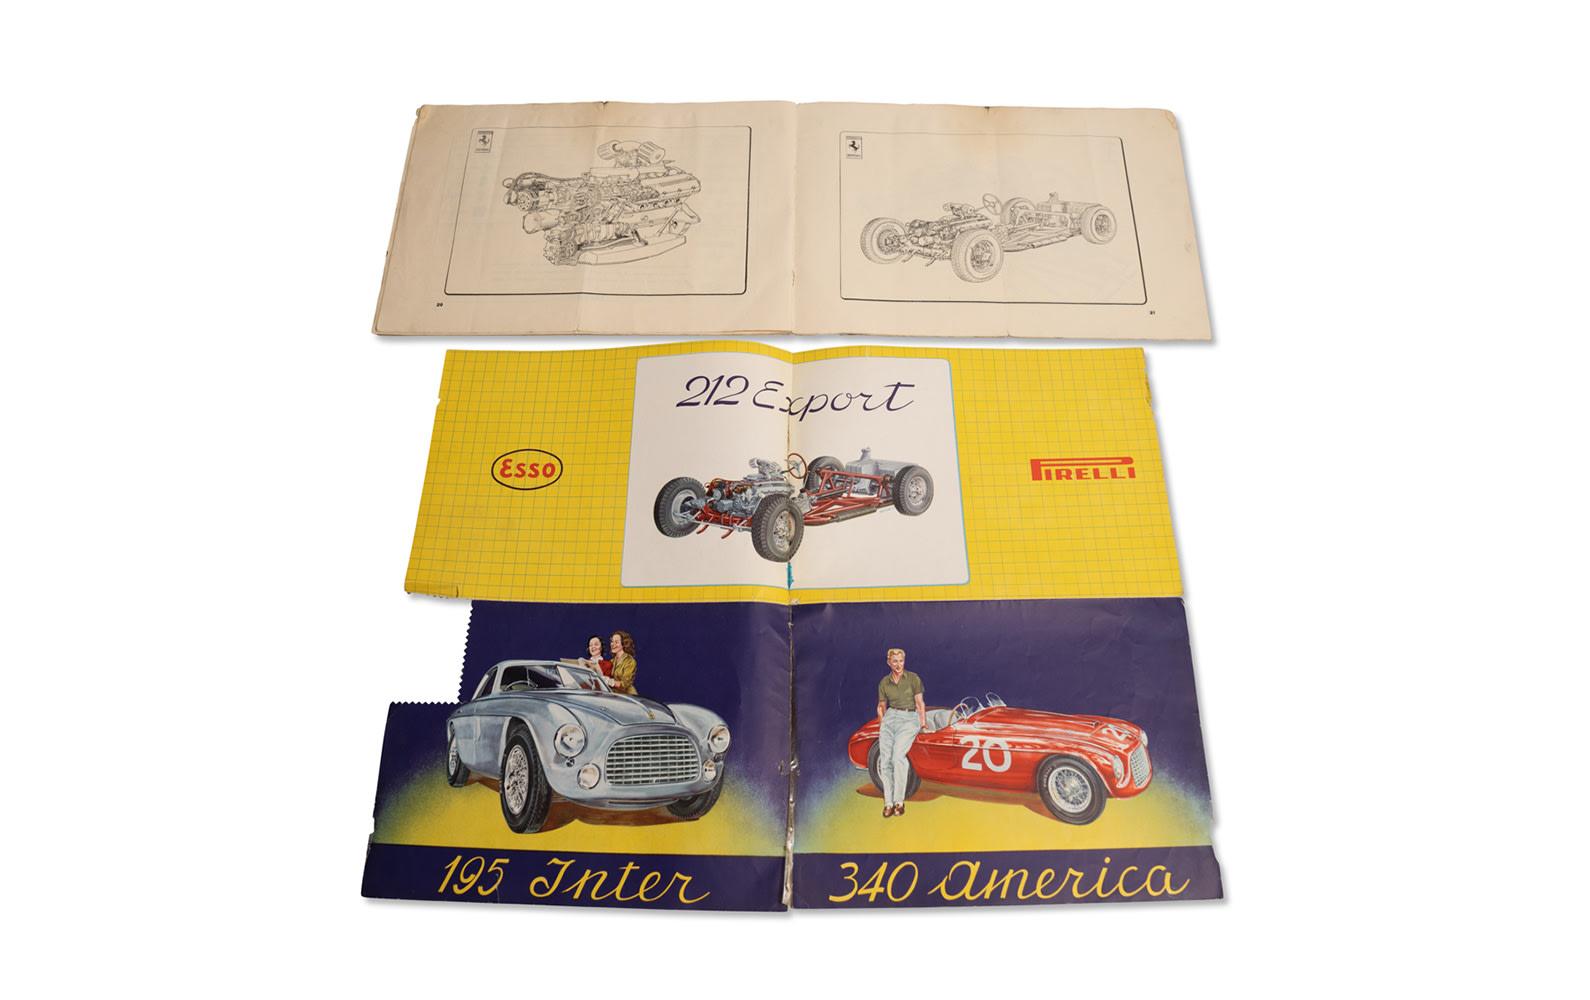 Ferrari Tipo 166/195/212/340 Instruction Manual and 30 Anni di Esperienze Brochure